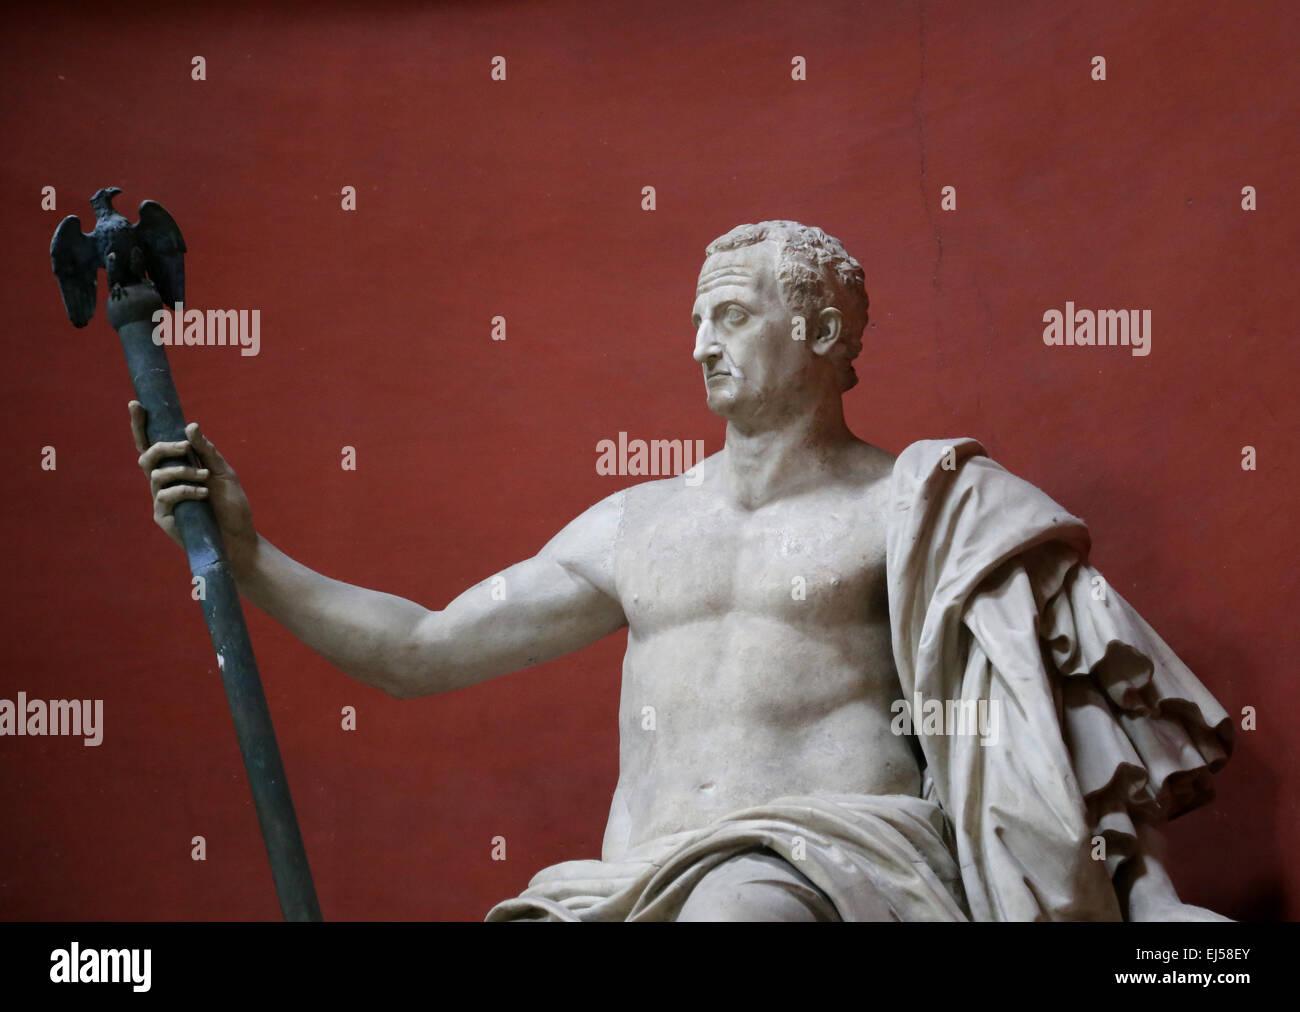 Statue of the emperor Galba (3 BC-69 AD). Colossal statue from Aurelian walls. Restored by Bartolomeo Cavaceppi. - Stock Image